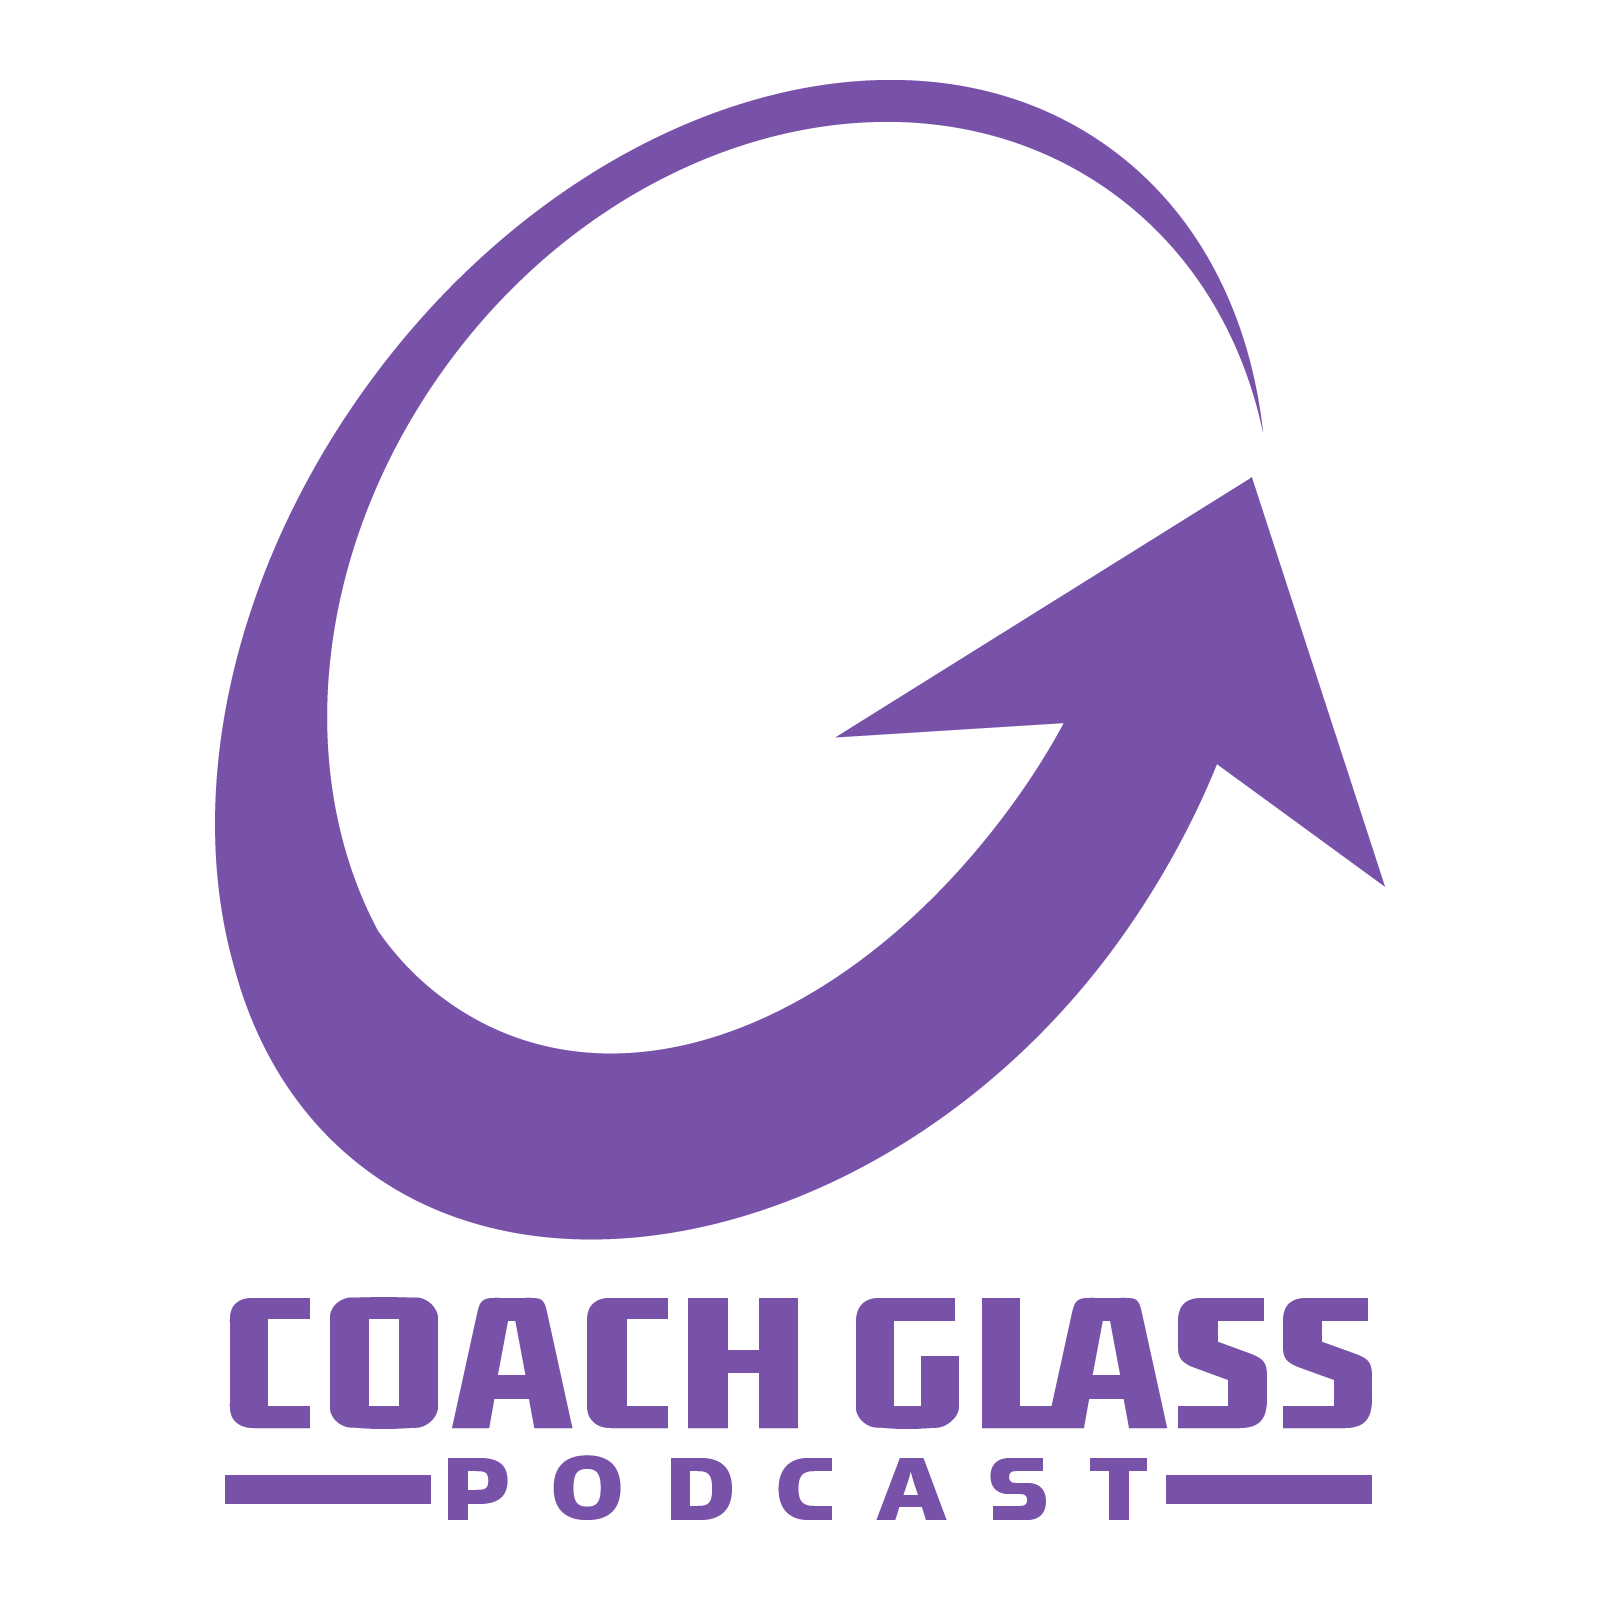 Coach Glass Podcast show art